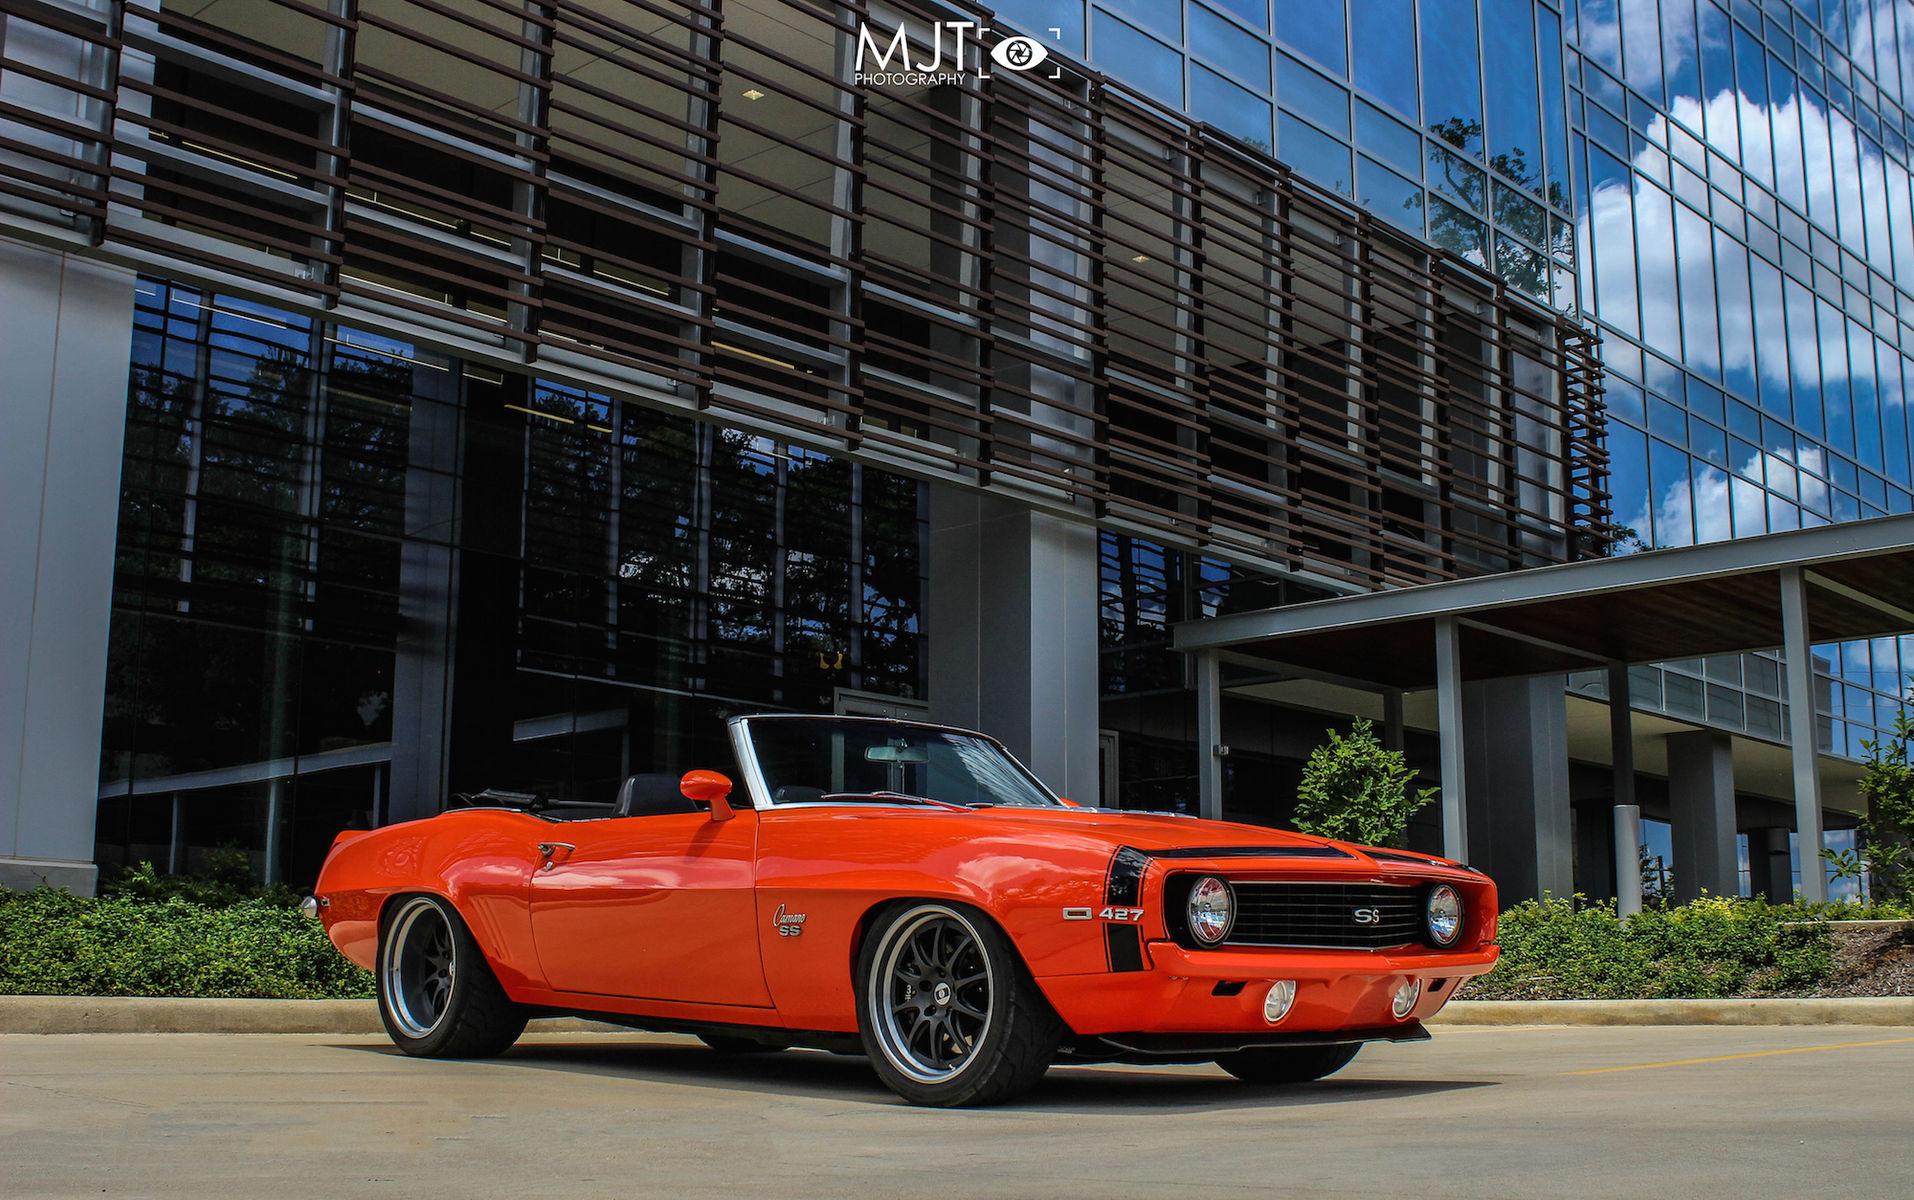 1969 Chevrolet Camaro   Tony's Deviate Motoring '69 Camaro Convertible on Forgeline GZ3 Wheels